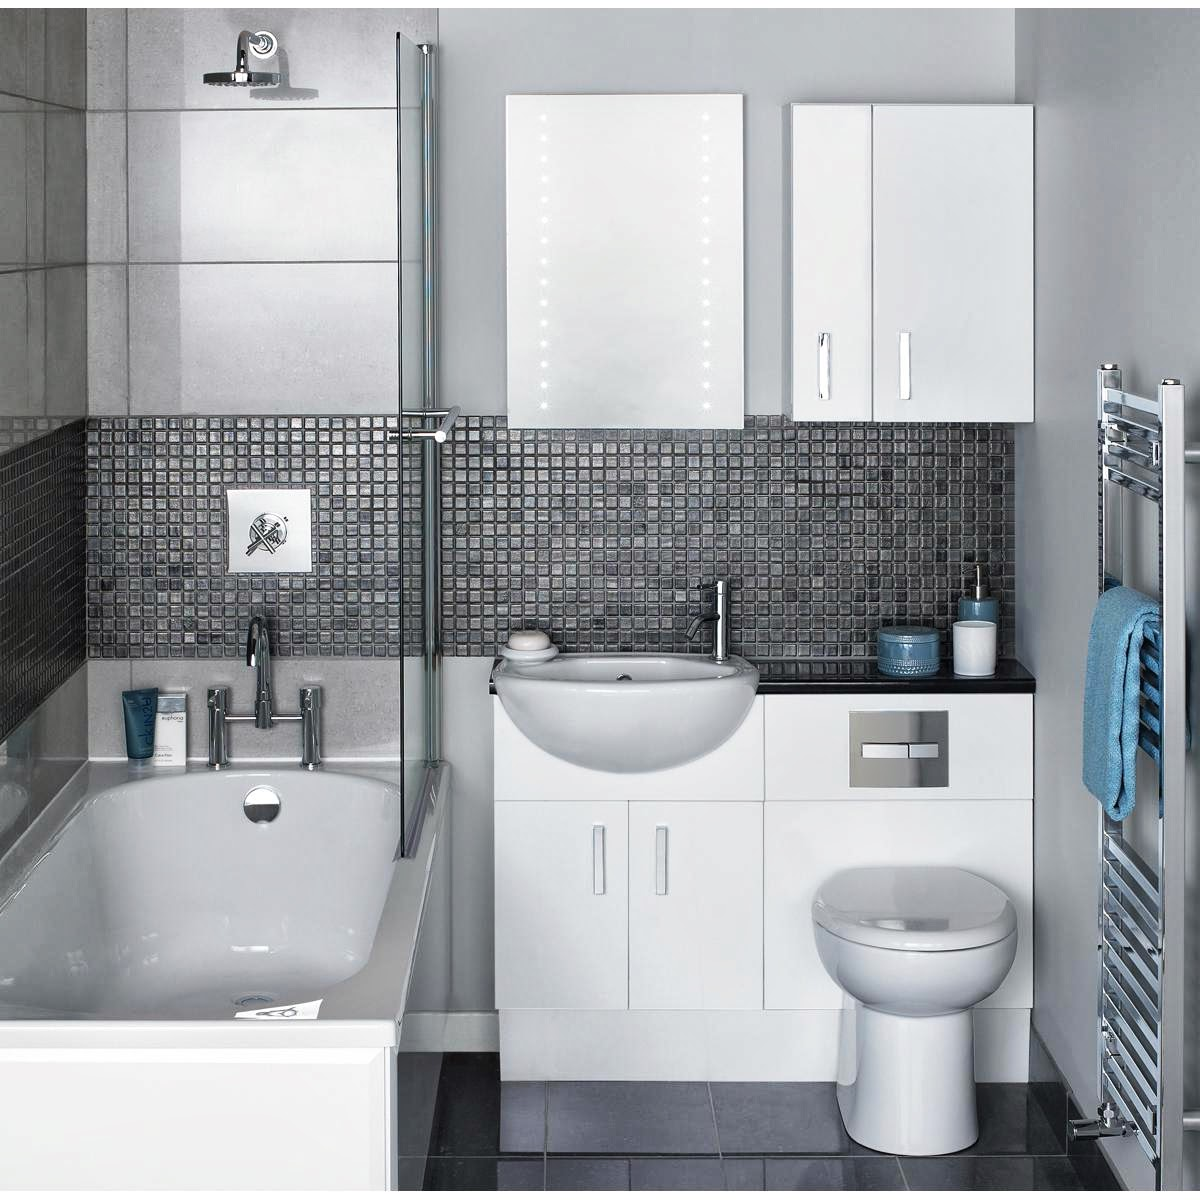 D Bathroom Planner Create A Closely Real Bathroom HomesFeed - 3d bathroom designs